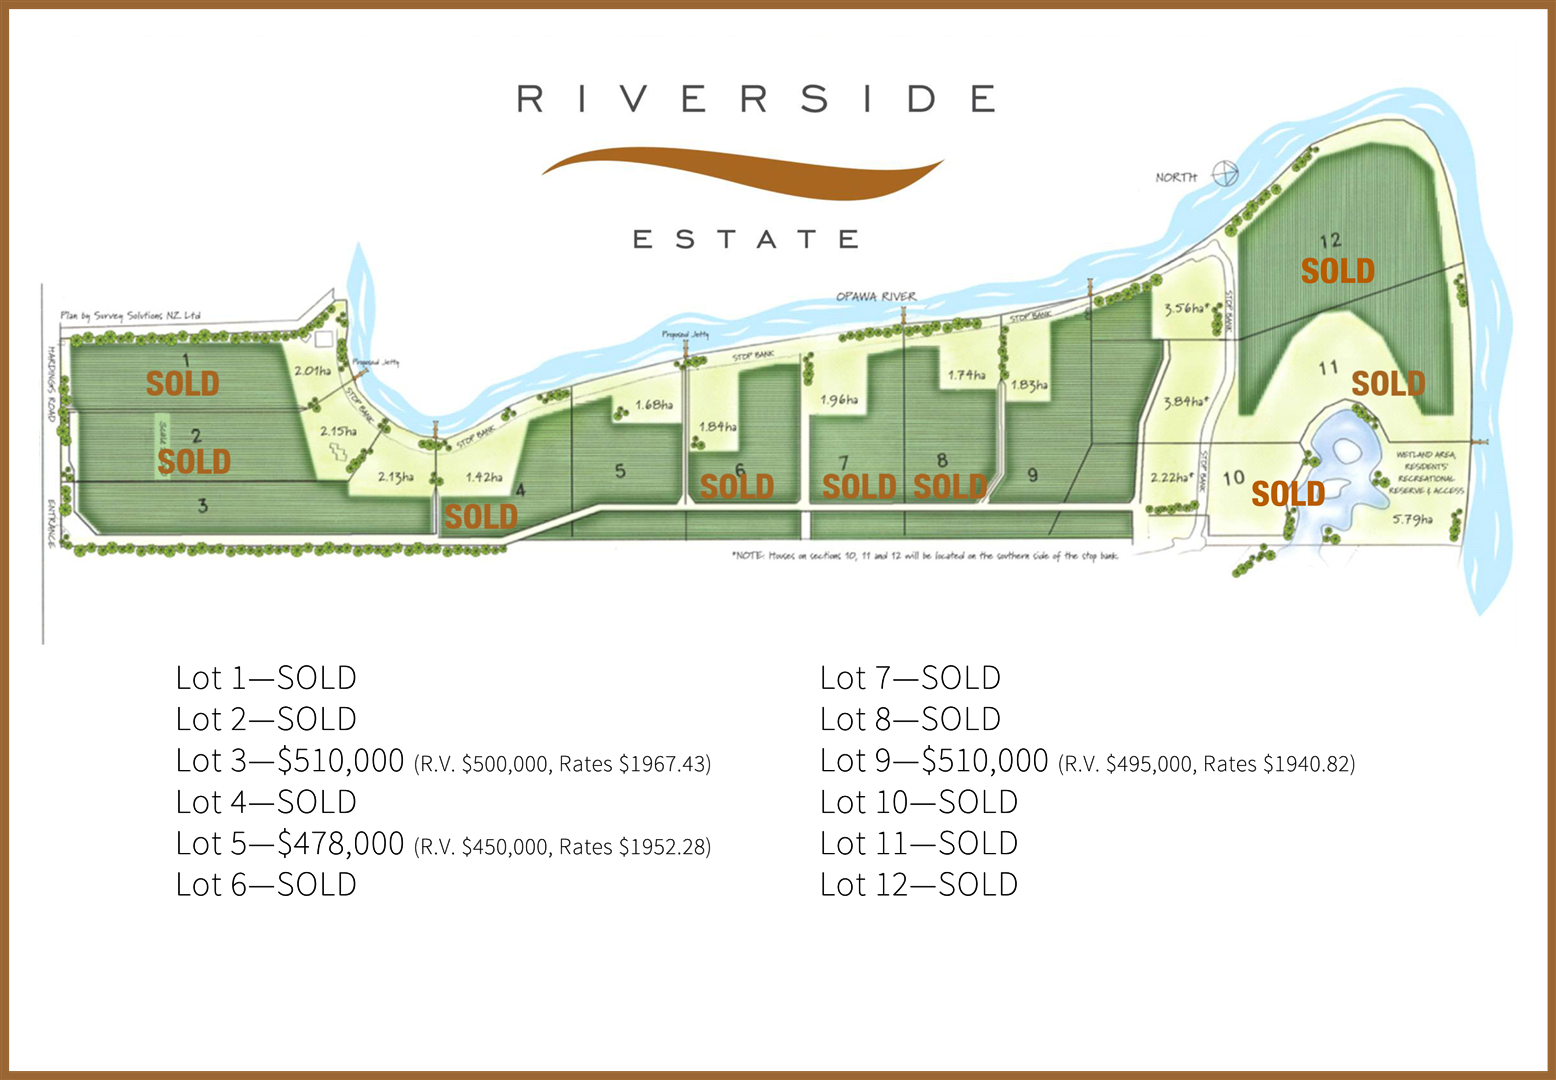 Riverside Estate